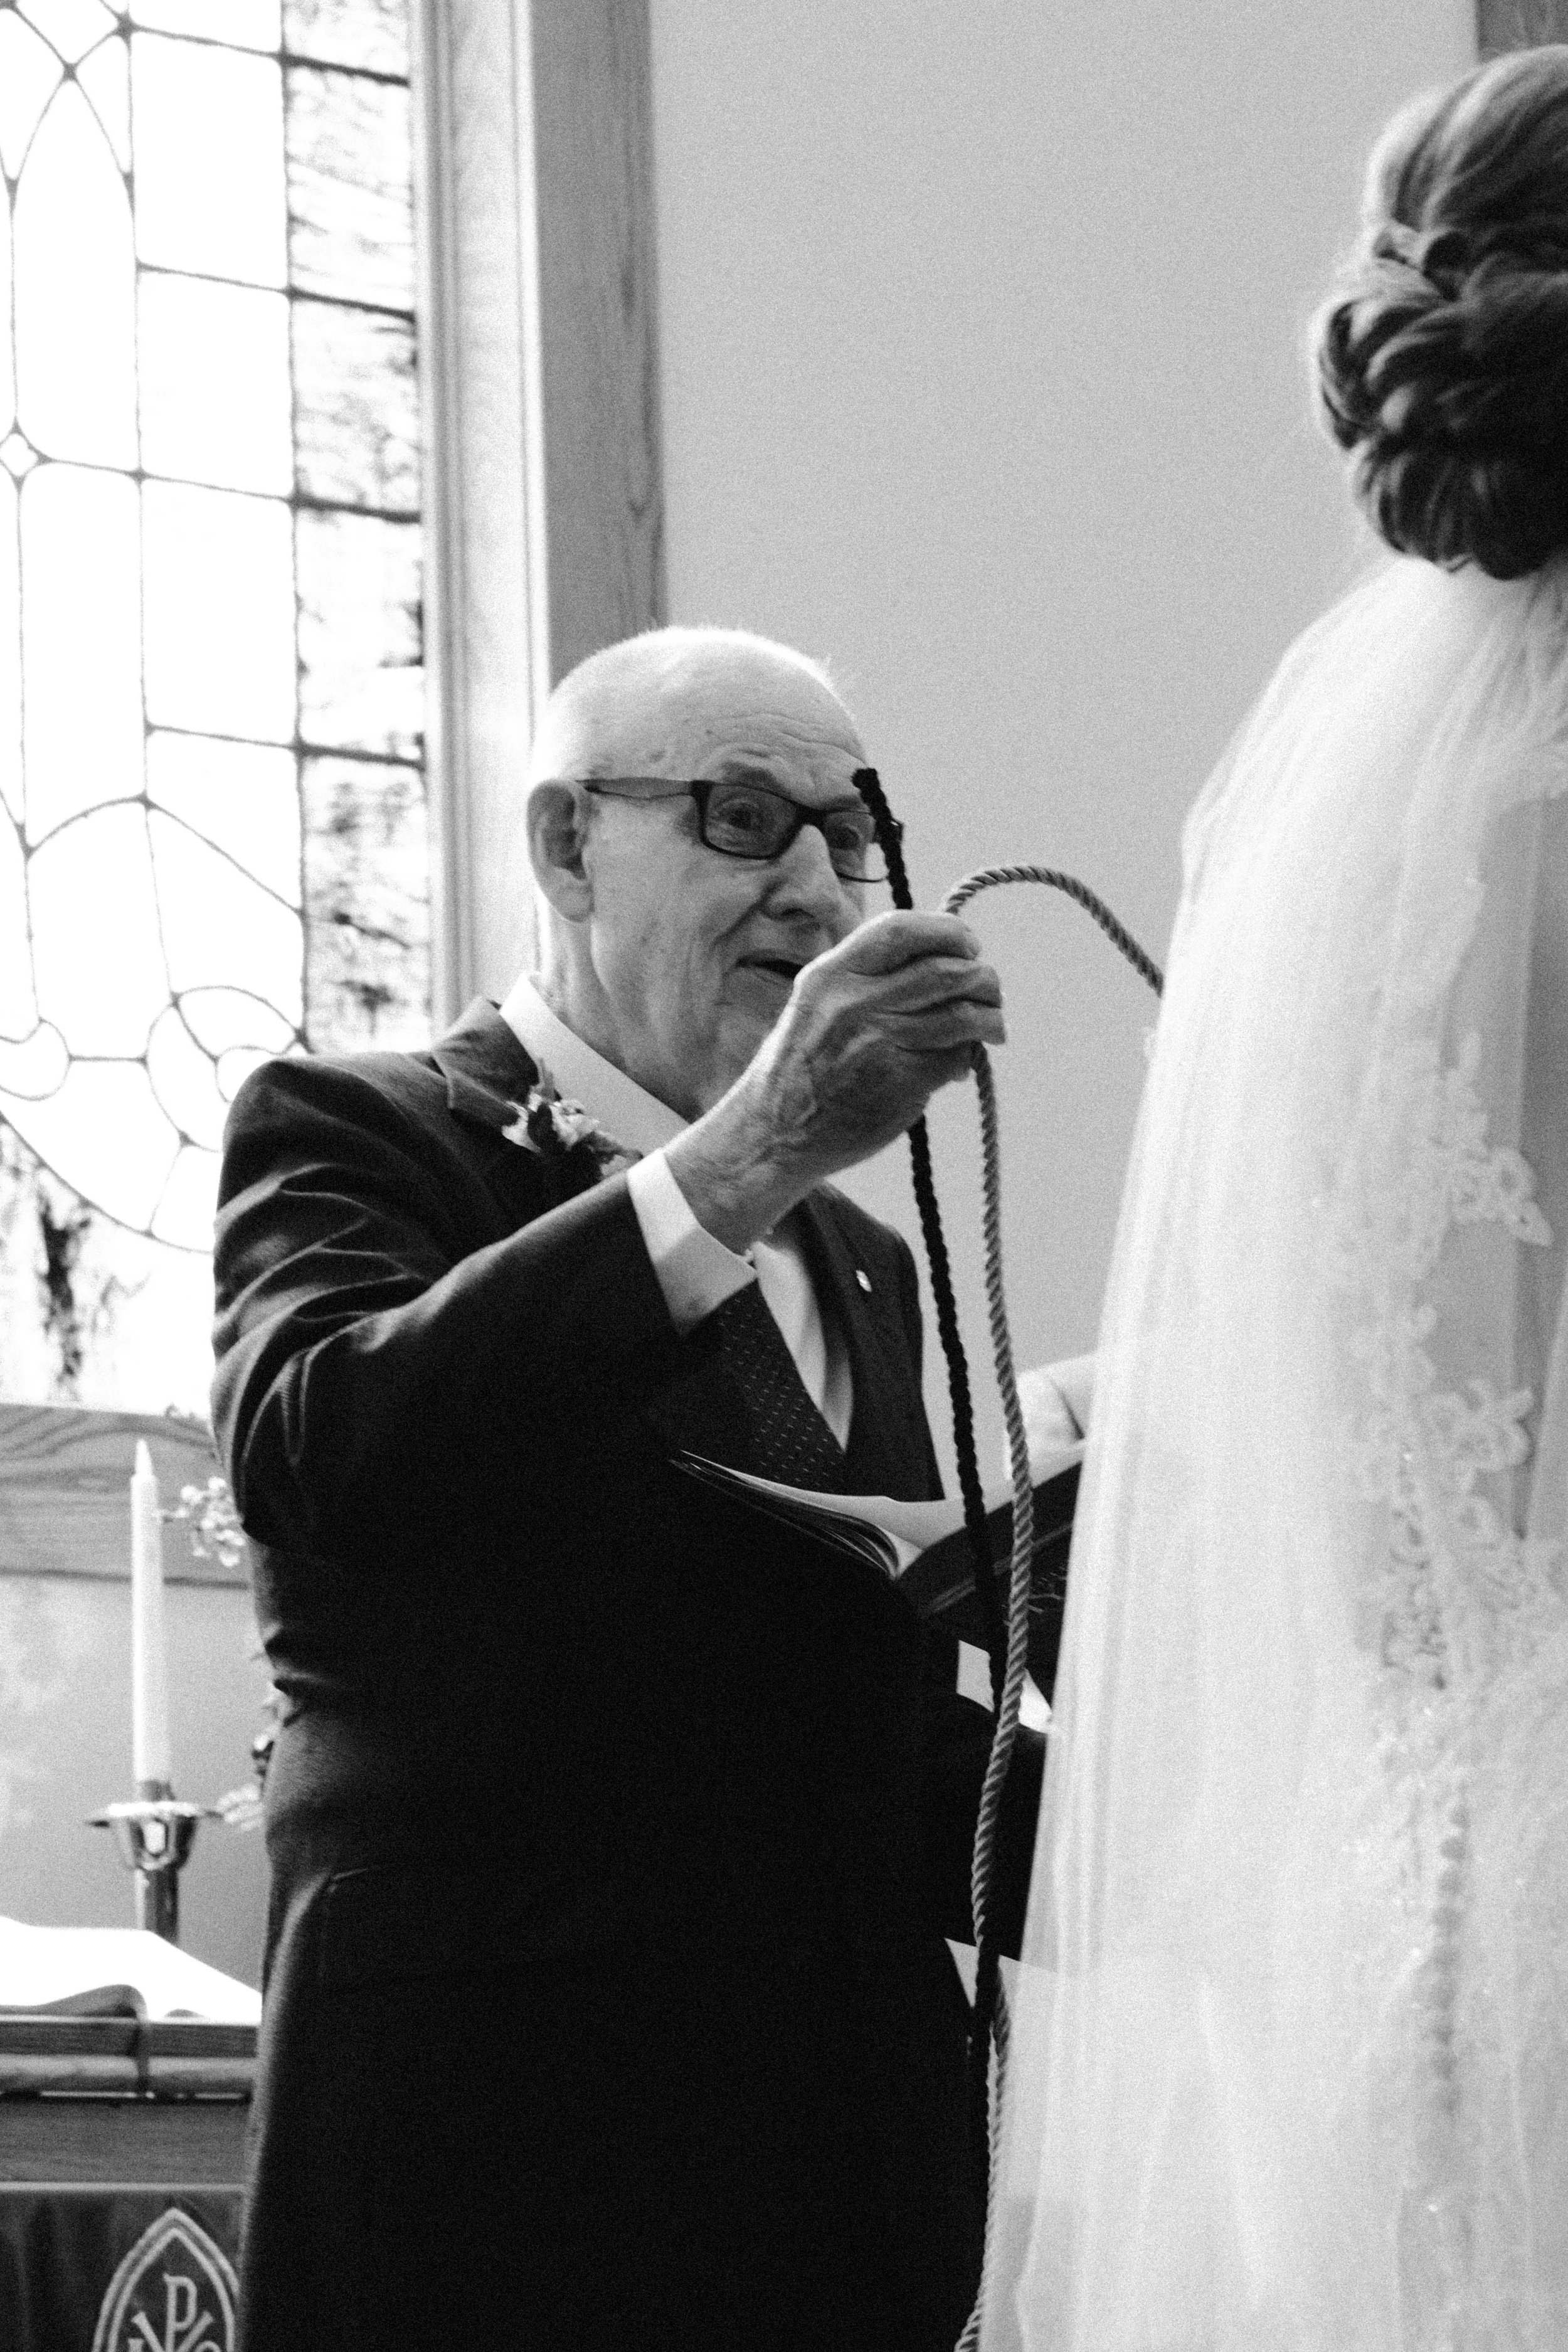 Iowa wedding_Dawn McClannan Photo-46.jpg